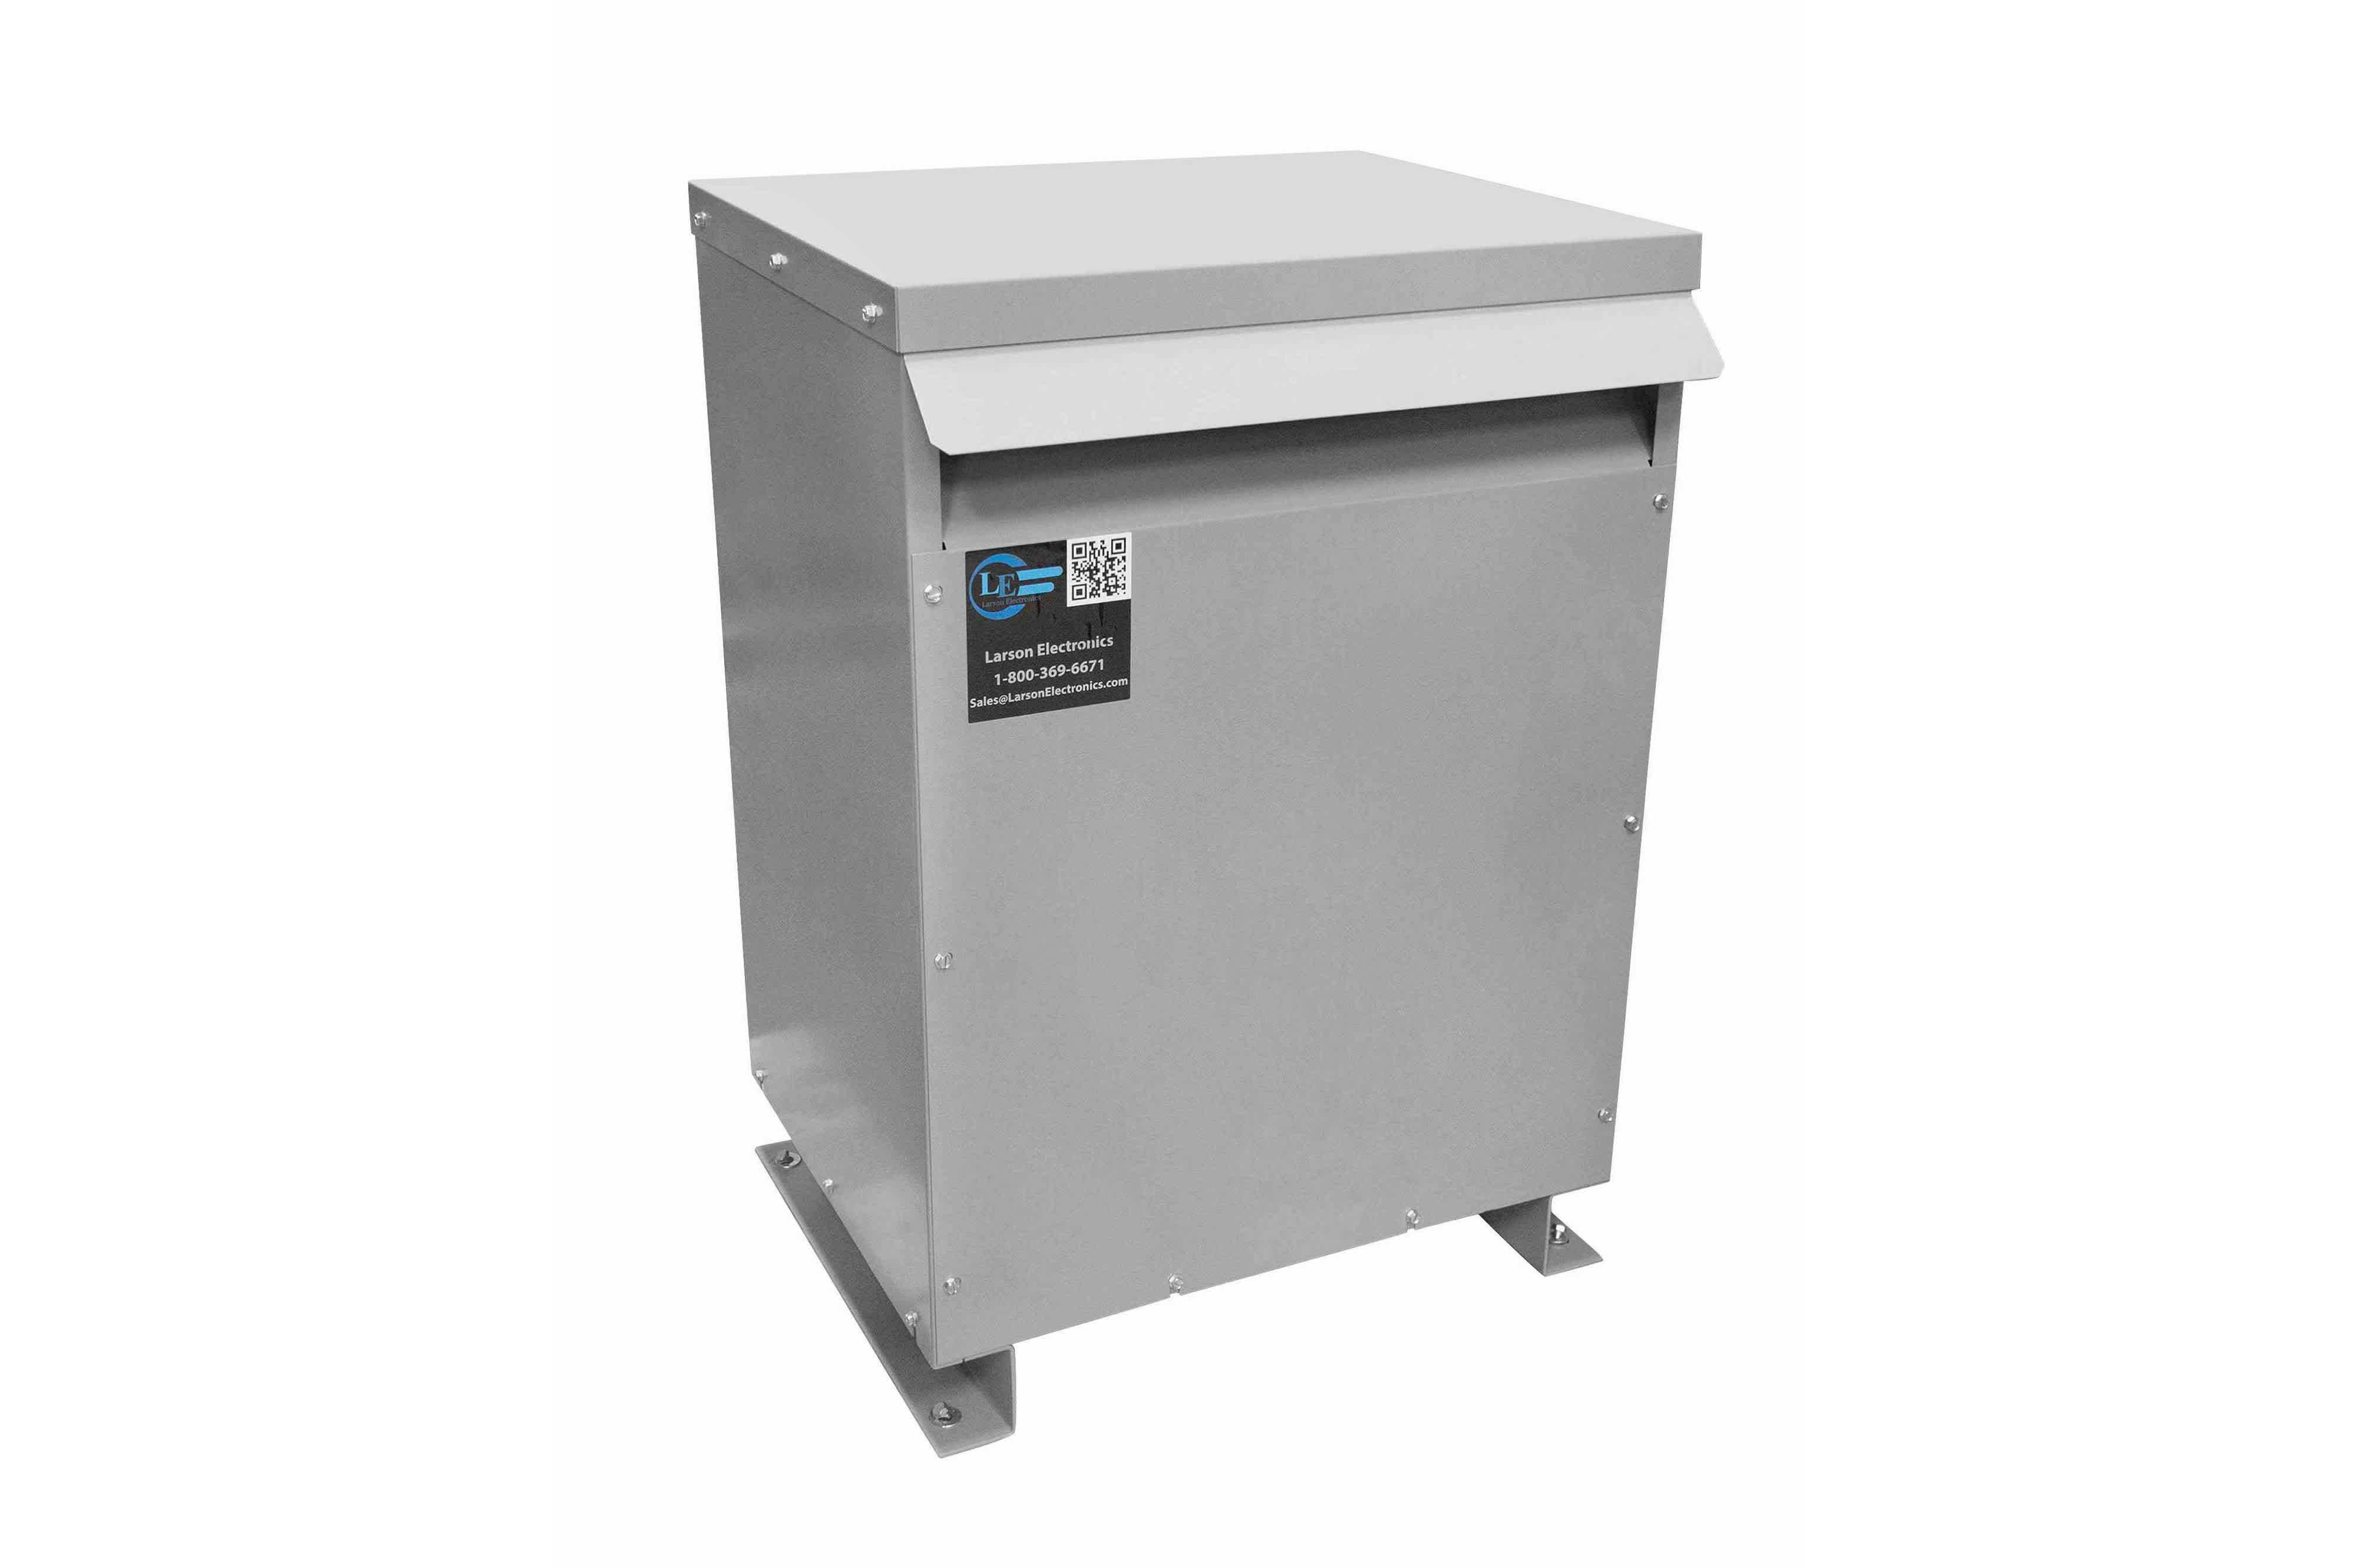 15 kVA 3PH Isolation Transformer, 575V Wye Primary, 380Y/220 Wye-N Secondary, N3R, Ventilated, 60 Hz